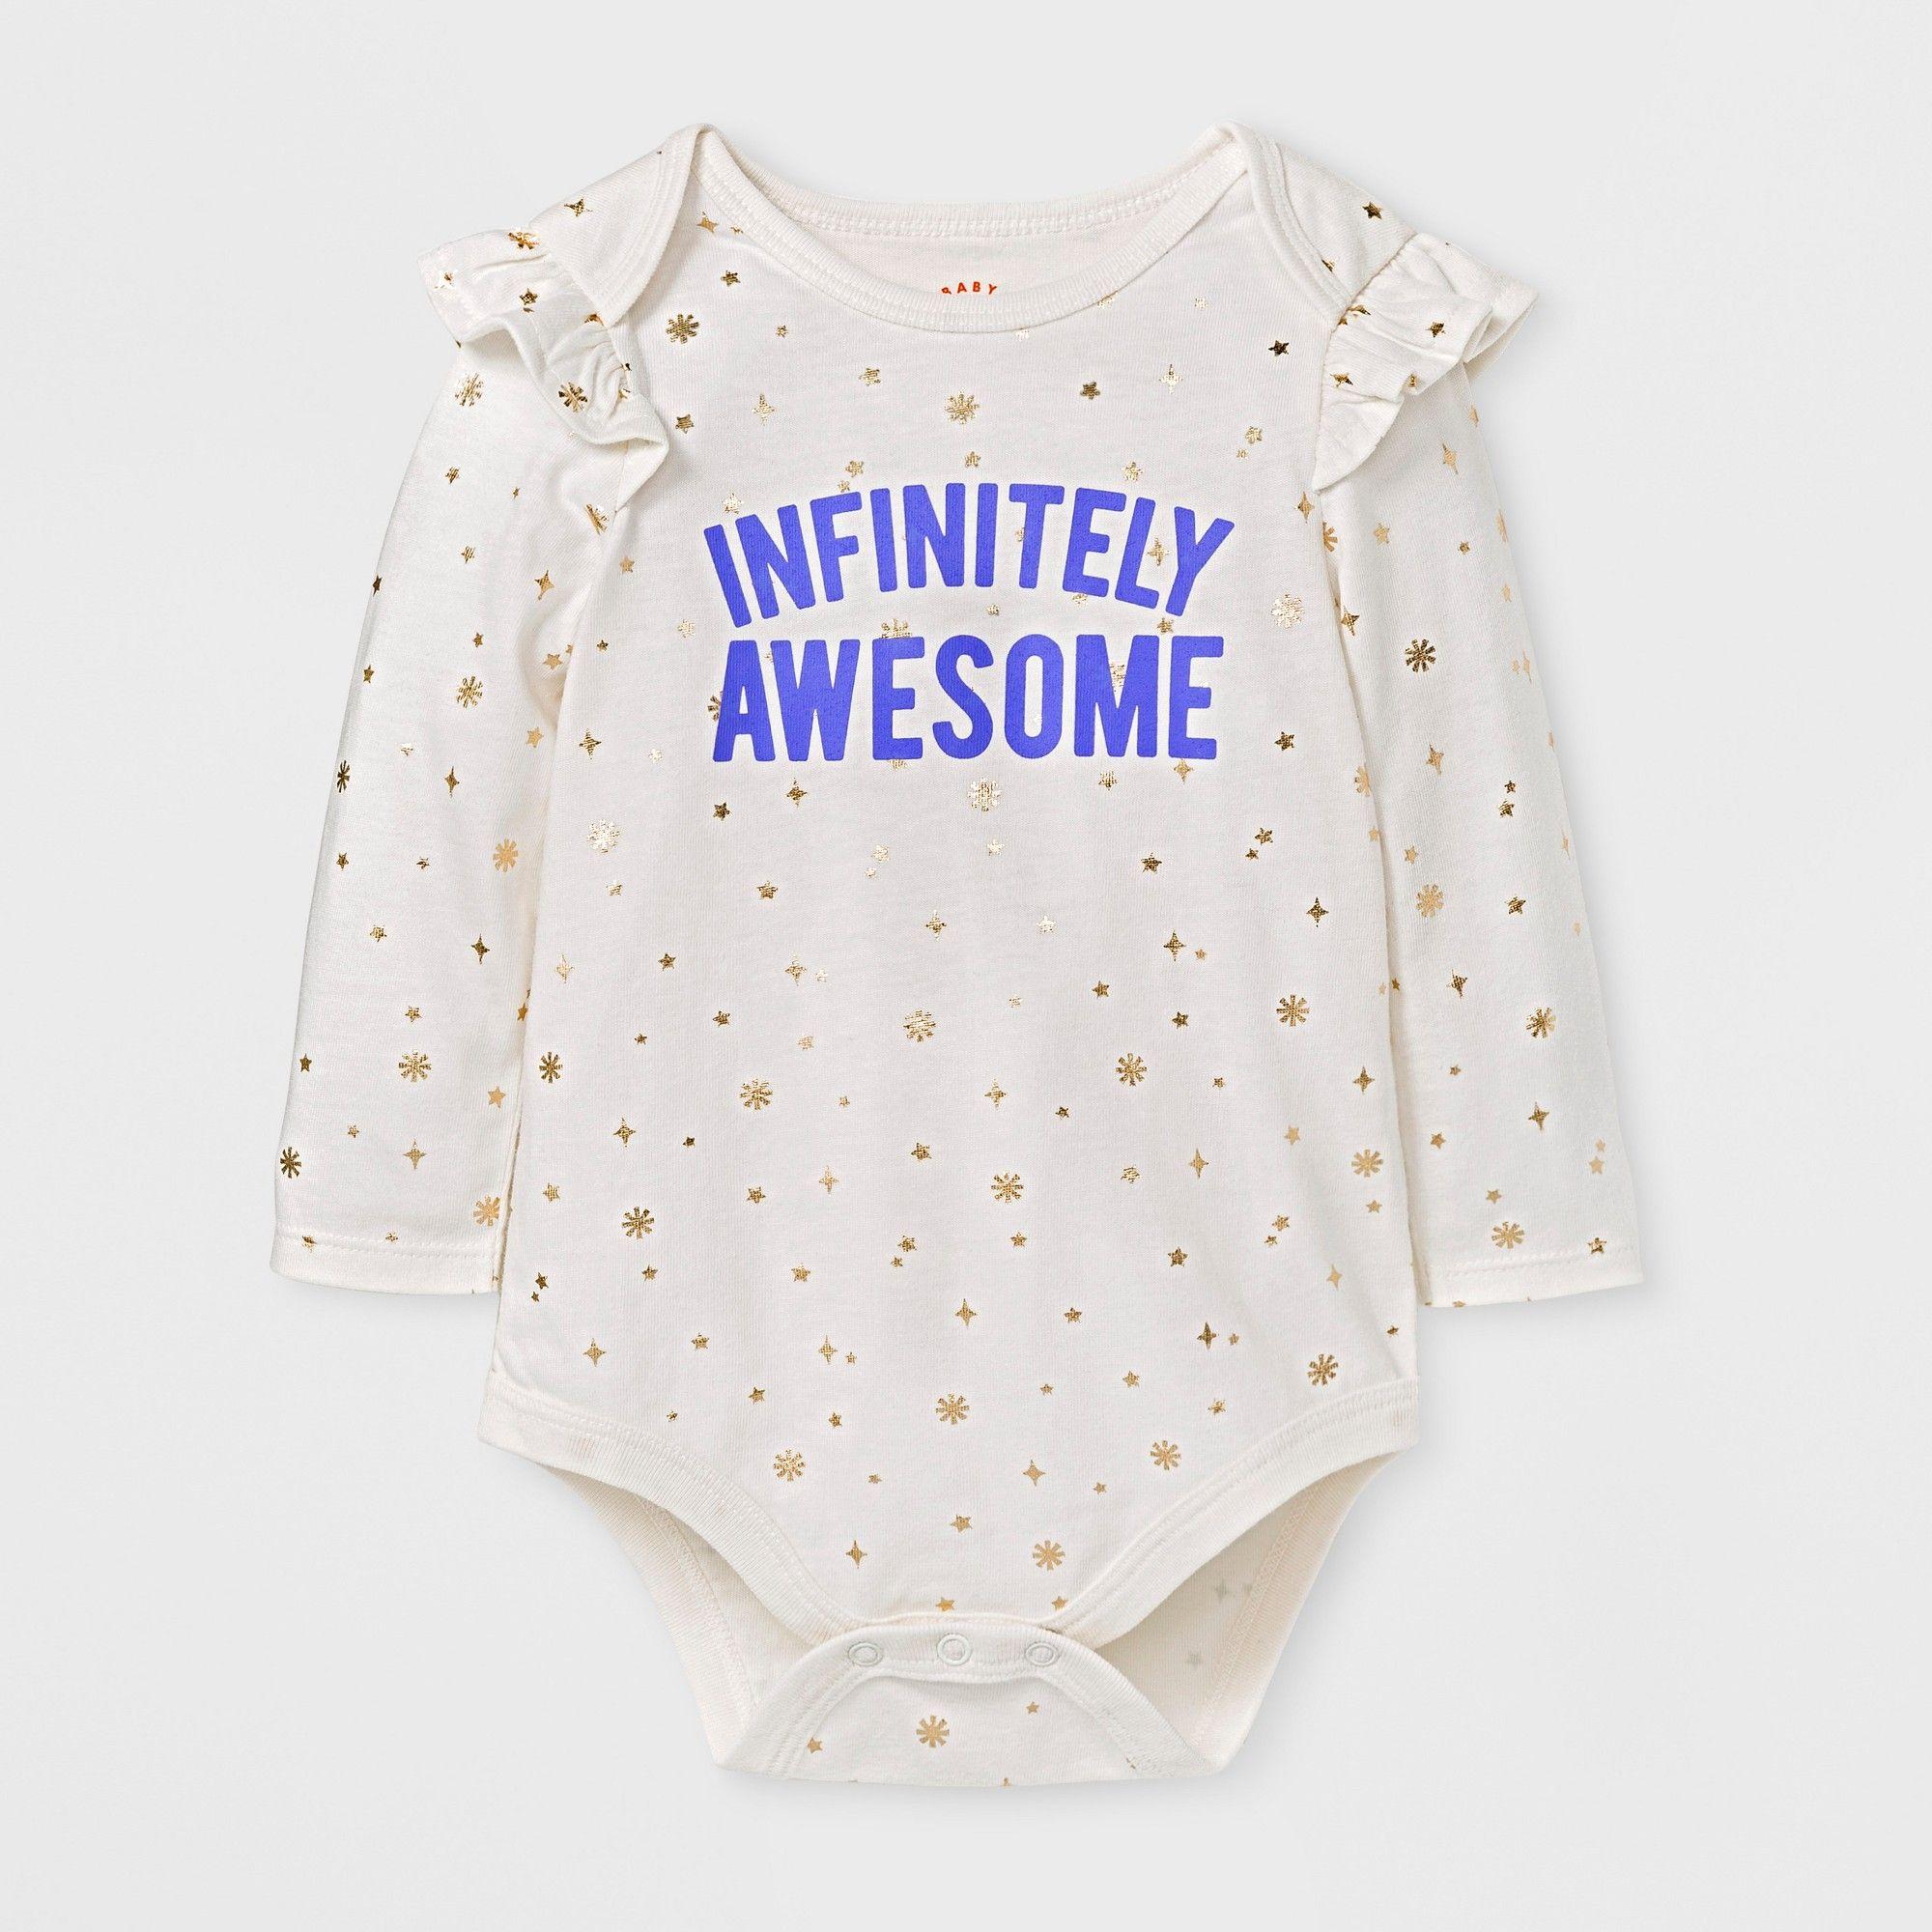 7ac4dc773 Baby Girls  Infinitely Awesome Bodysuit - Cat   Jack Cream 18 M ...